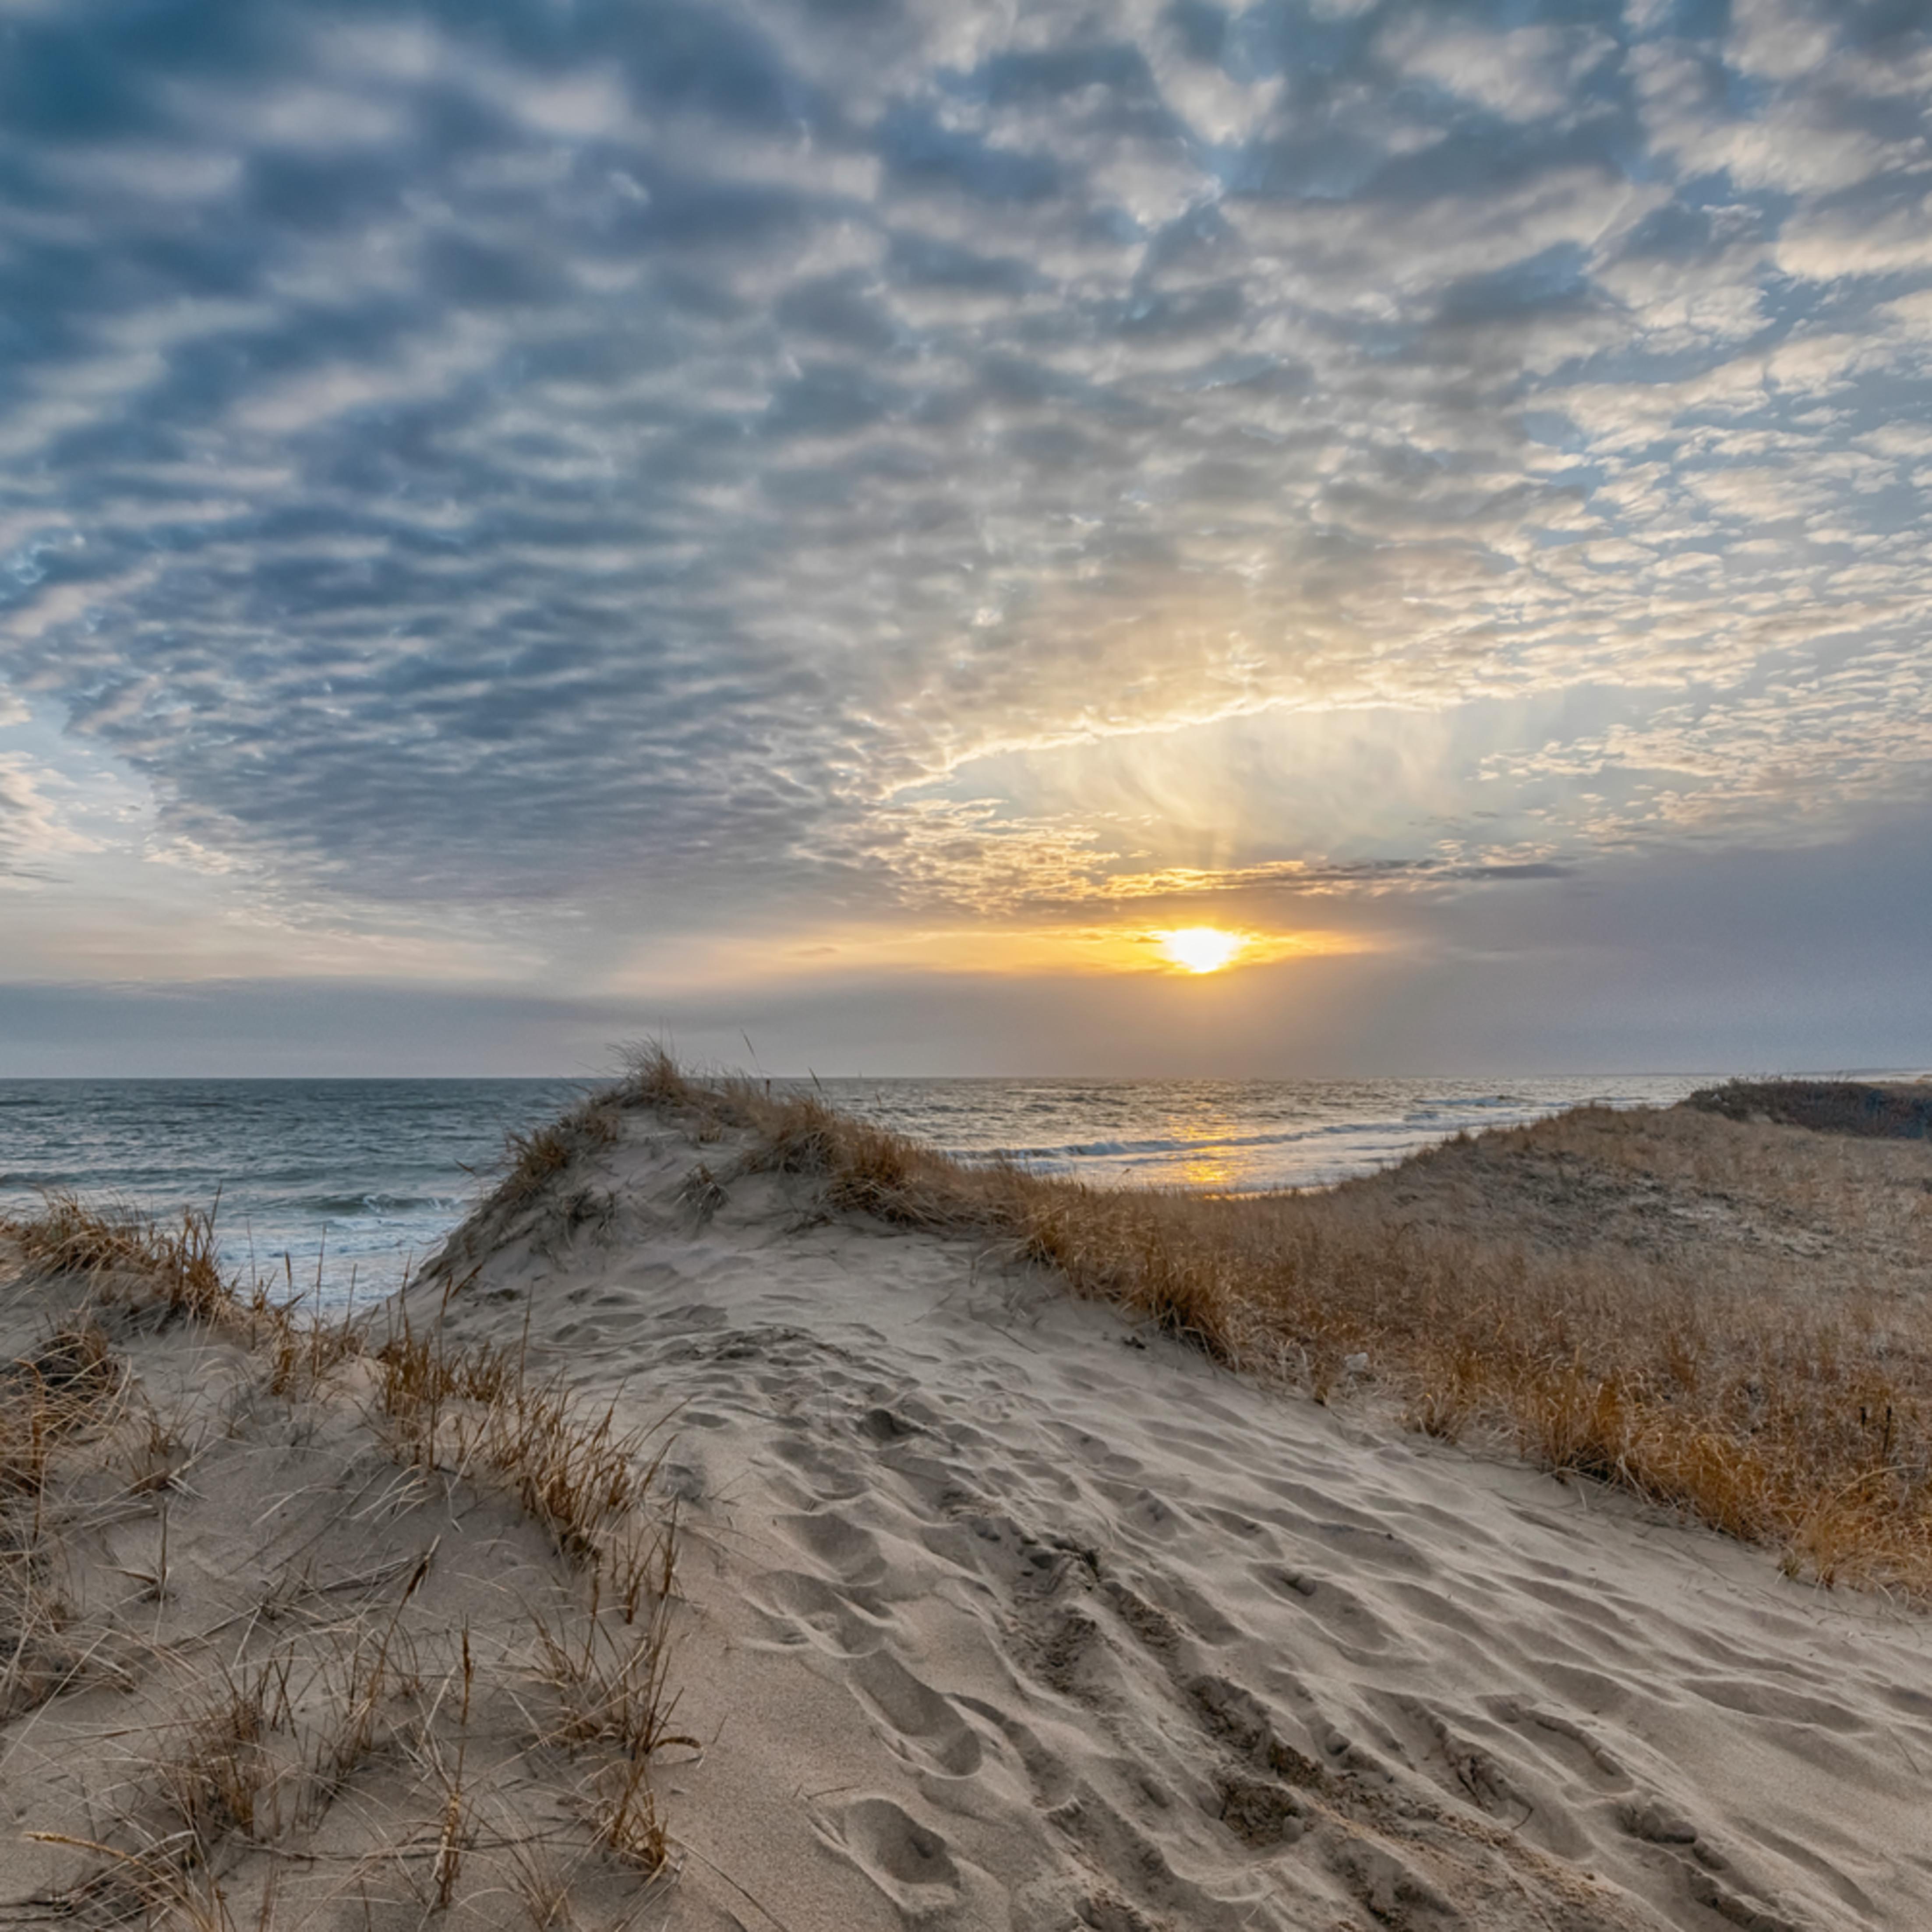 South beach winter clouds 2020 qpizrx